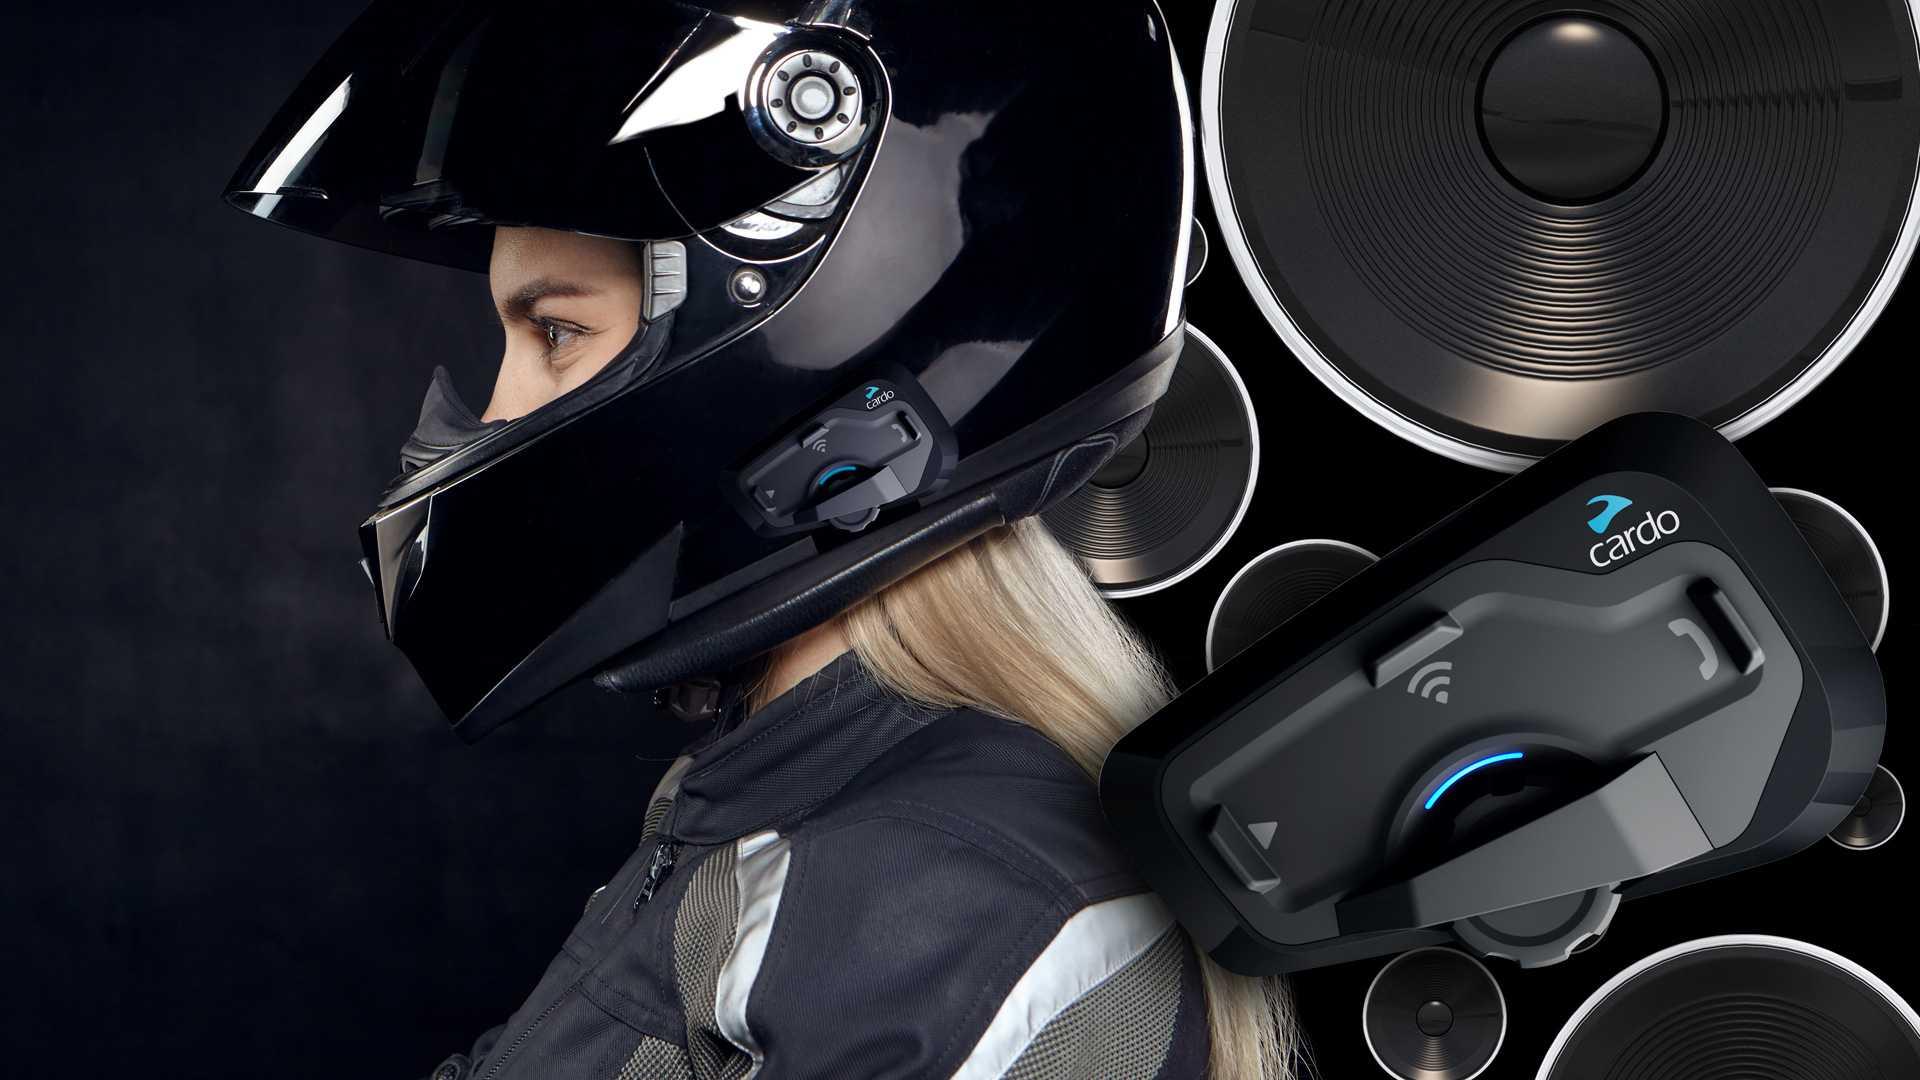 Helmet-To-Helmet Motorcycle Communicators: Worth It?